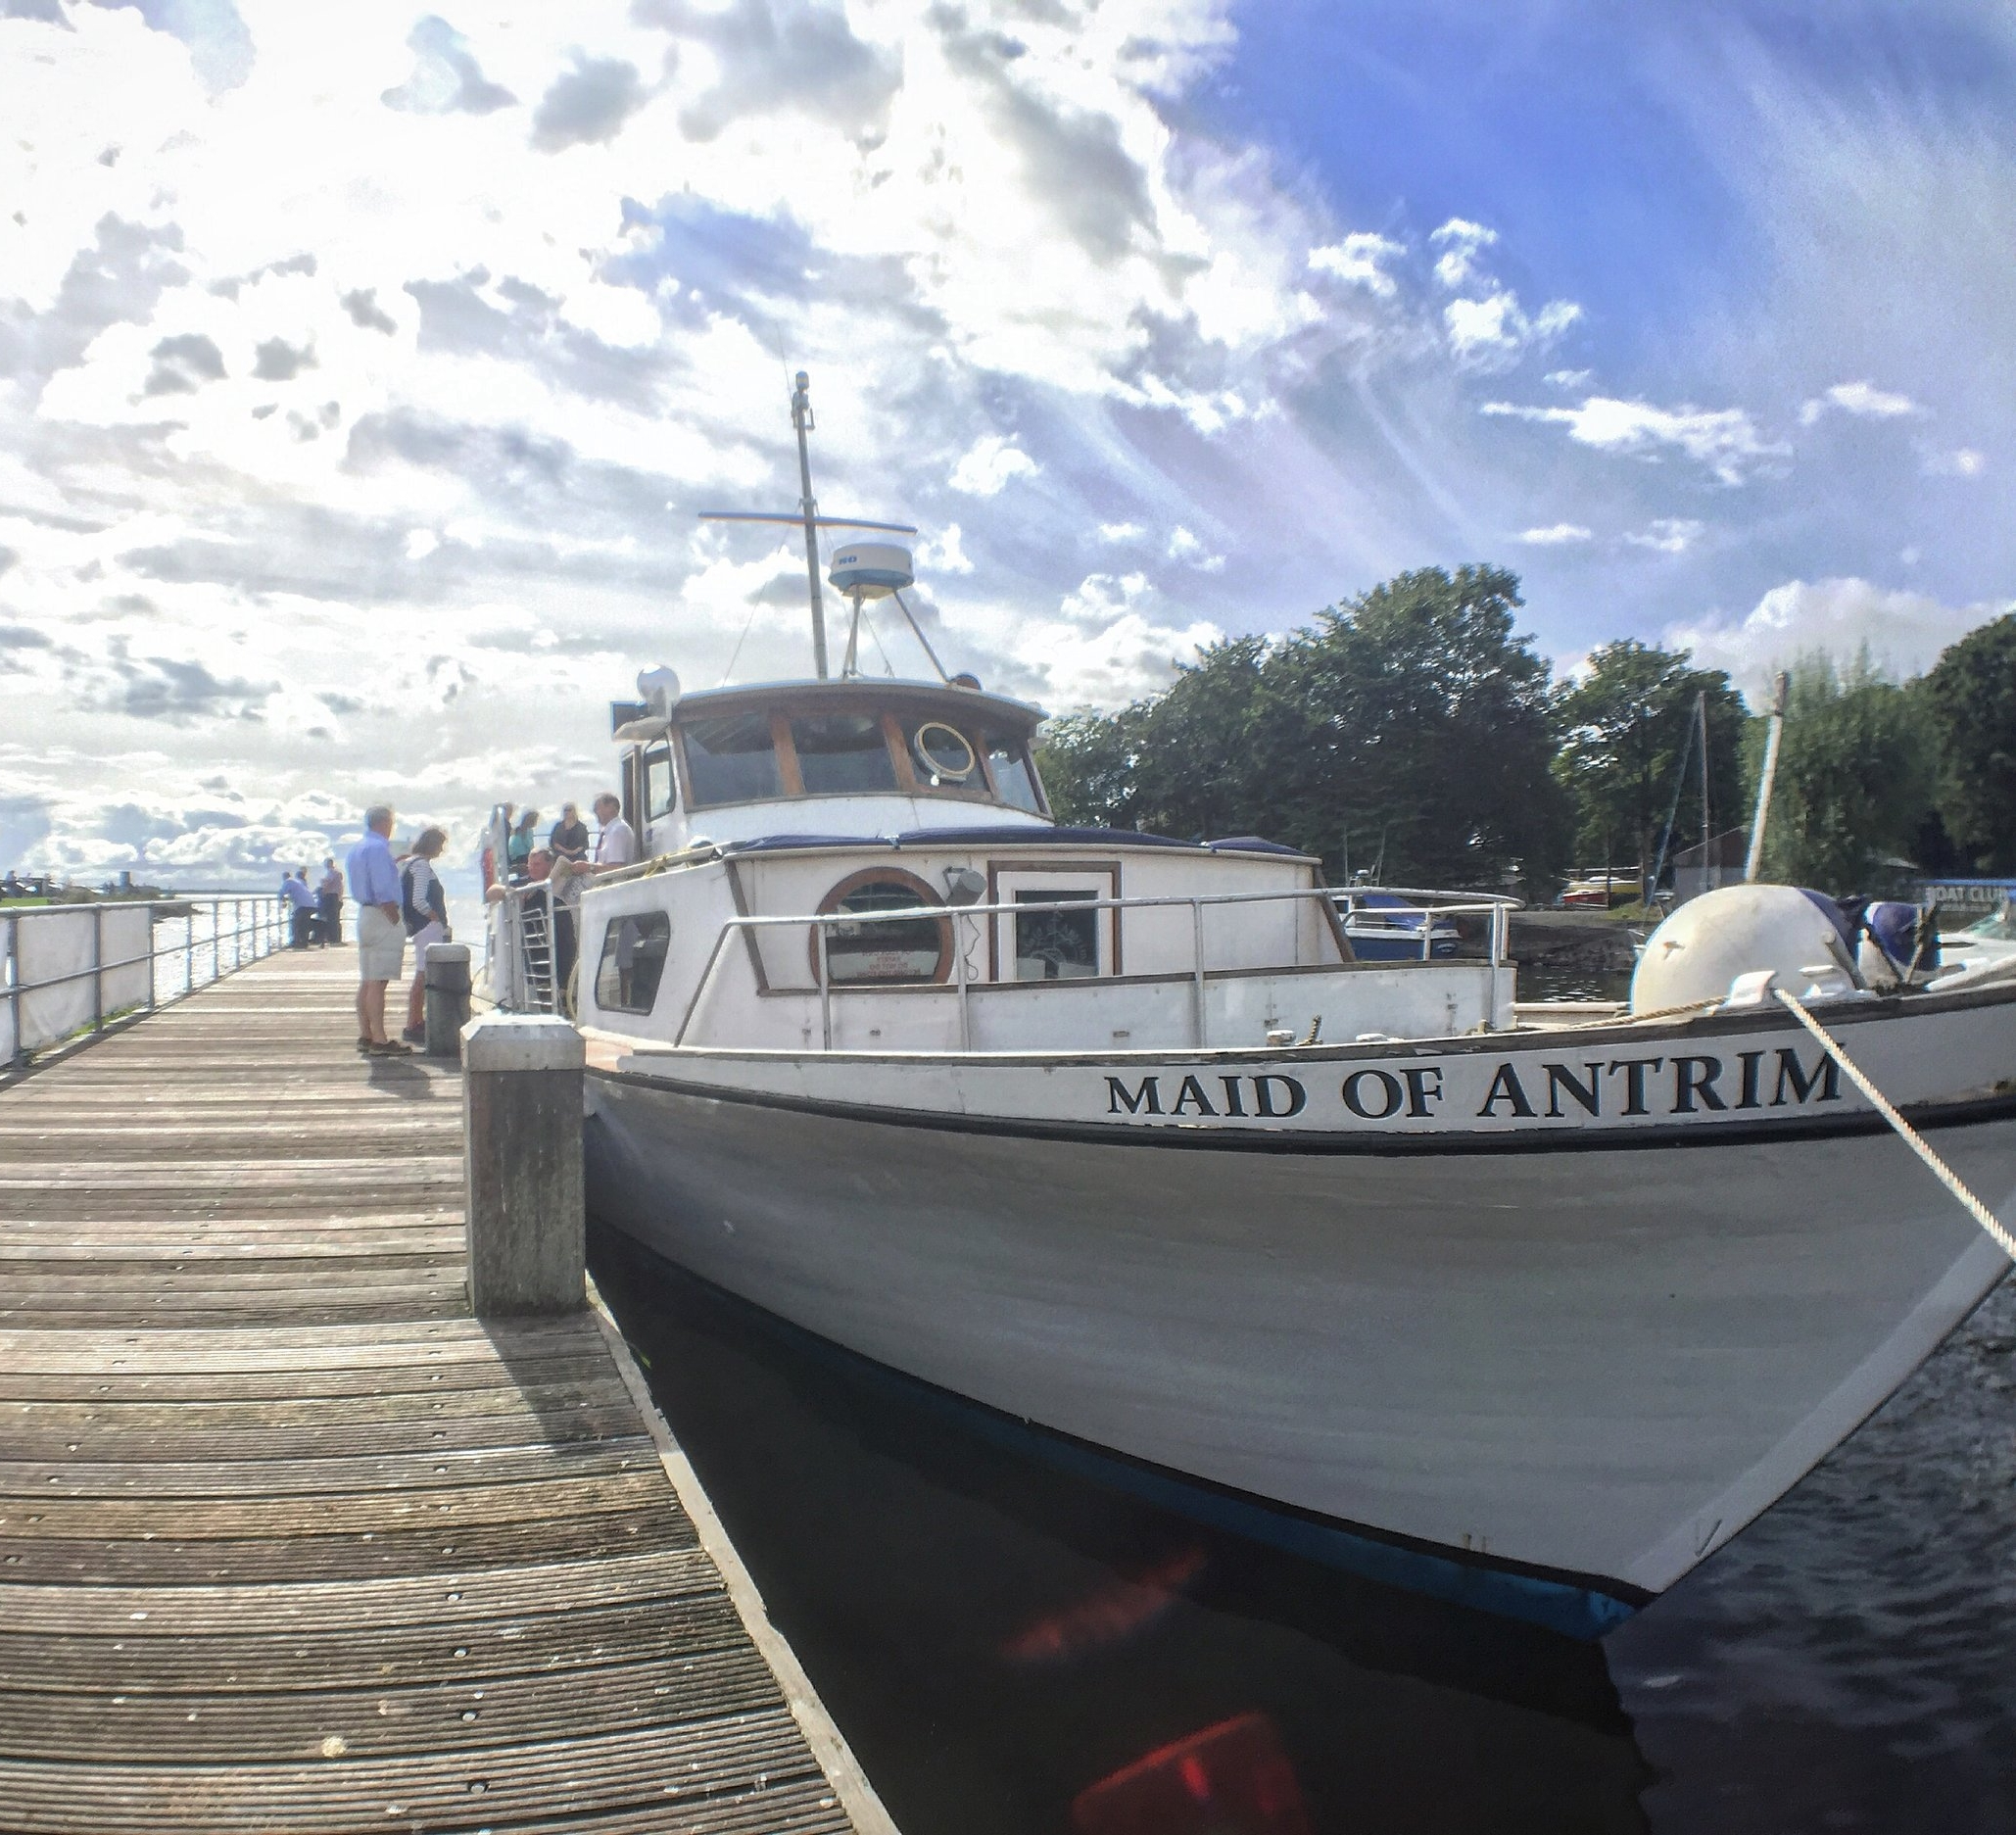 boat_maid_of_antrim_lough_neagh_antrim_northern_ireland_ni_explorer_niexplorer.jpg